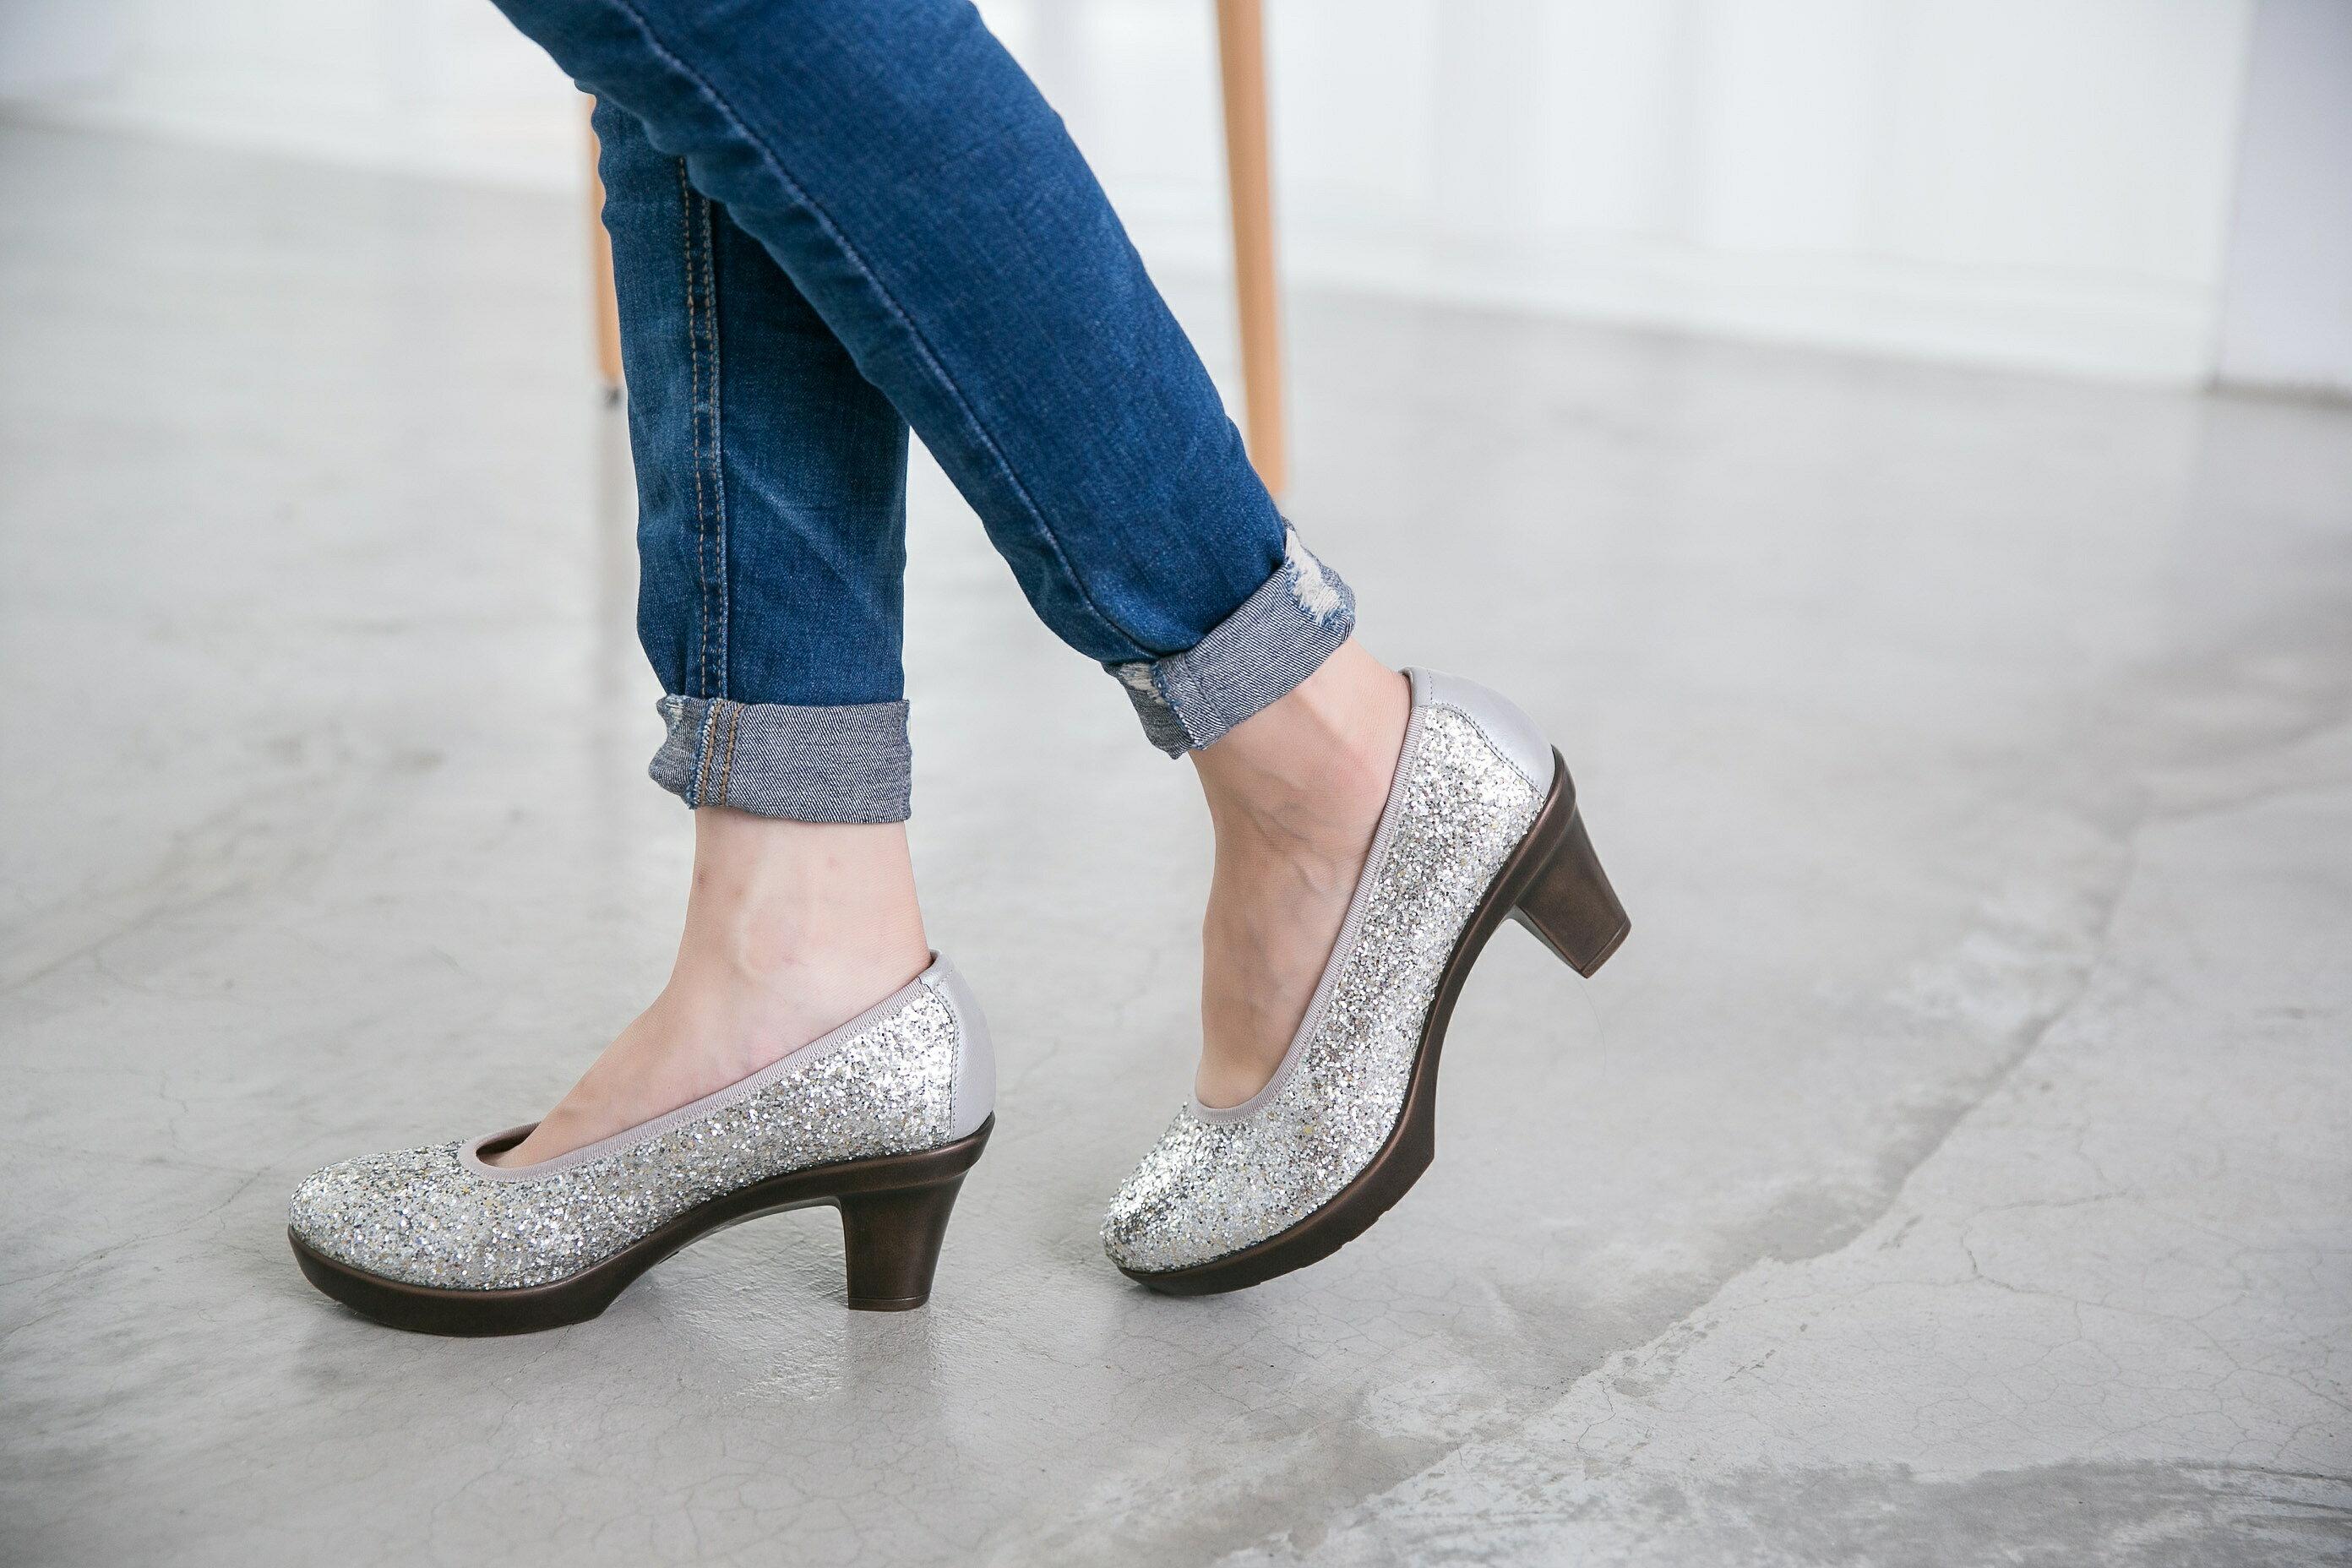 Aimez La Vie 舒適跟鞋 閃閃亮鑽約會Party厚底中跟鞋 1